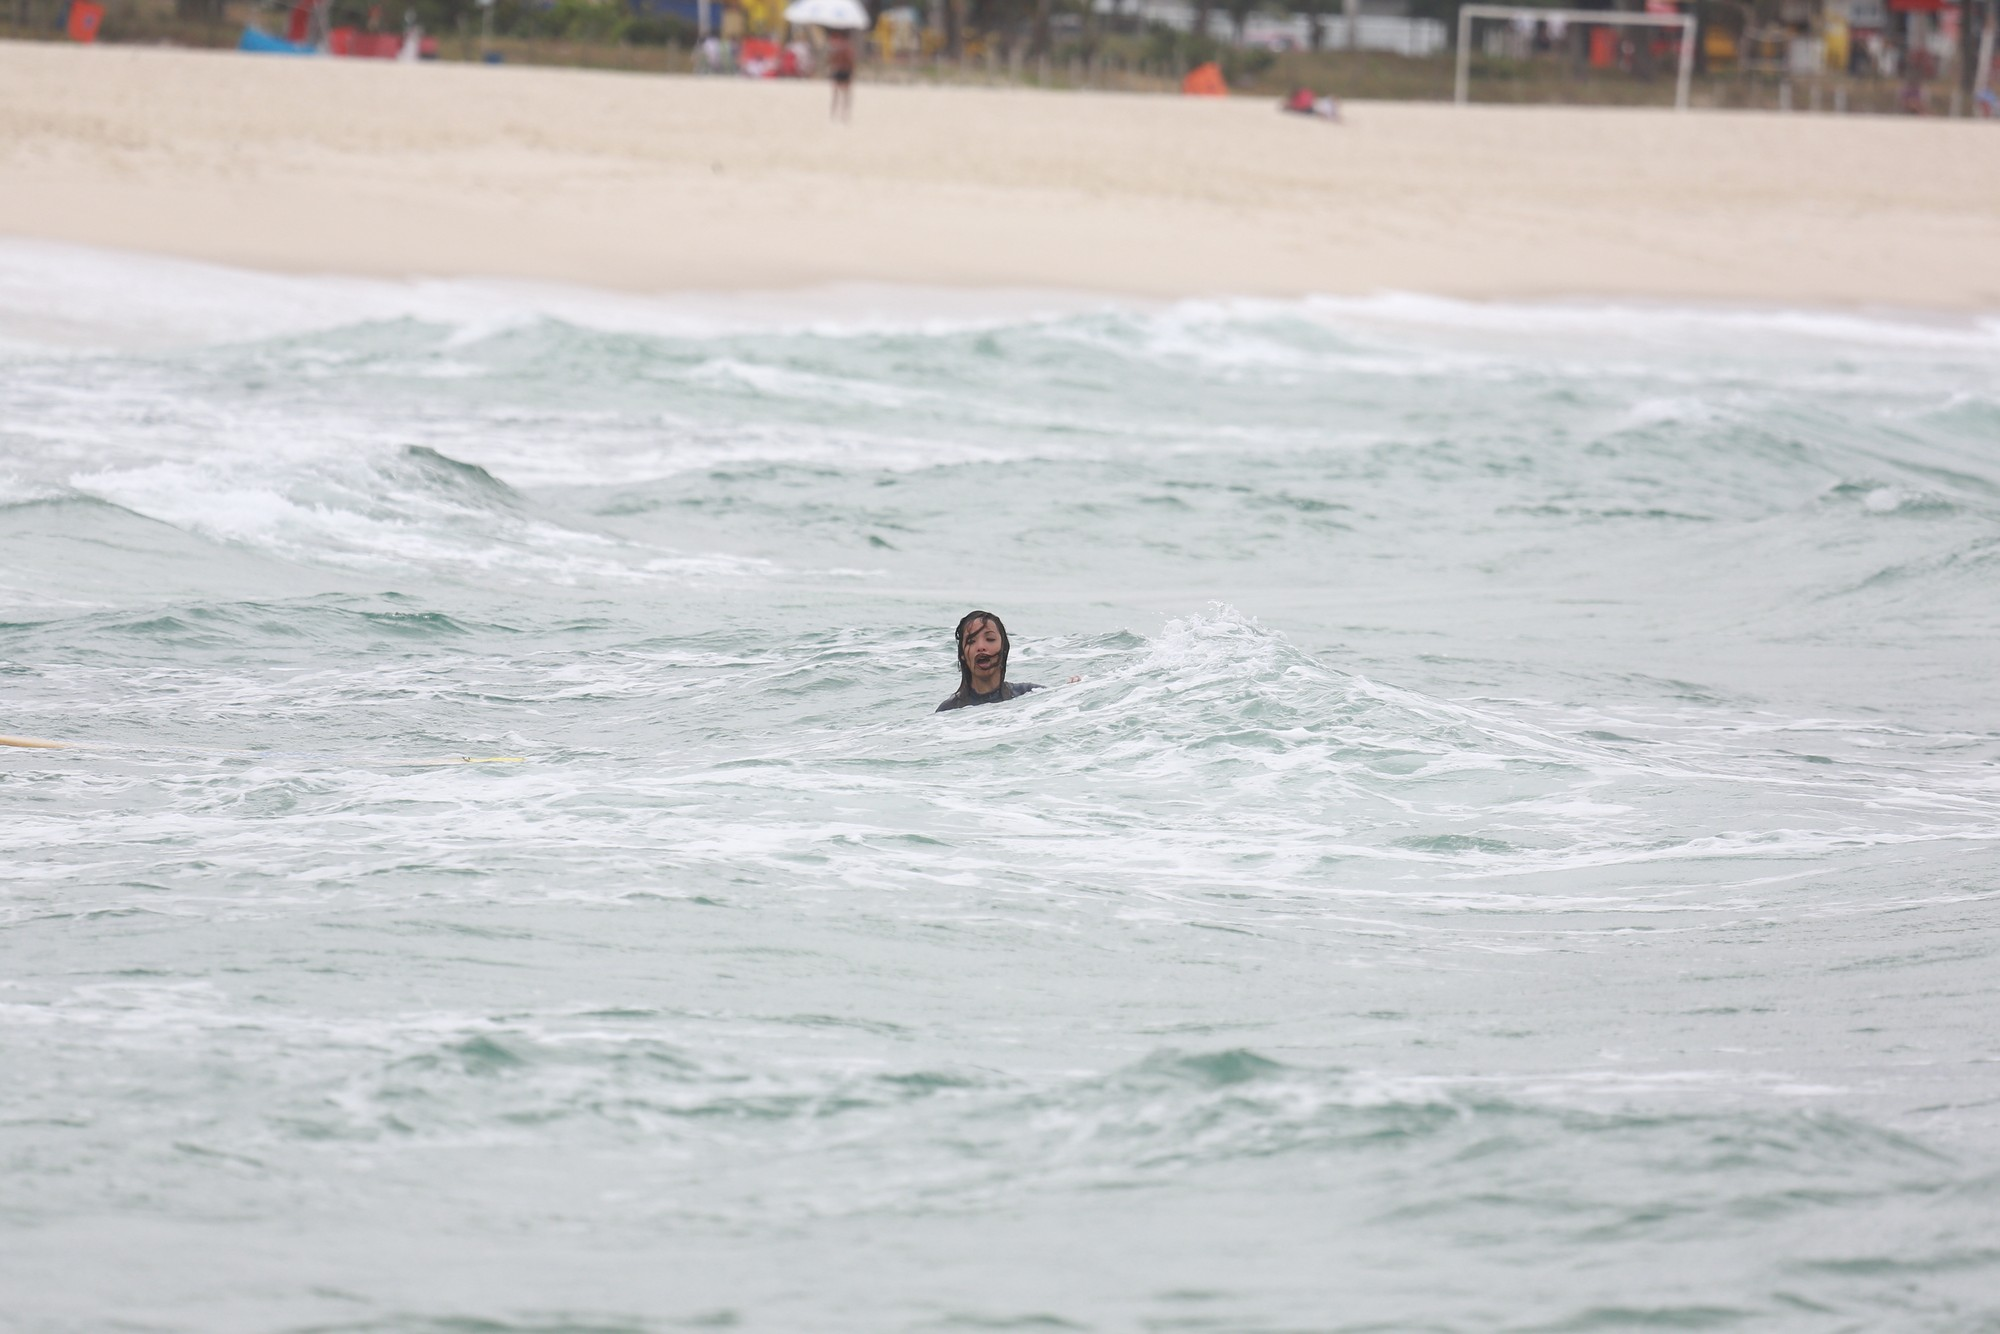 Carol Nakamura mergulha após desequilibrar na prancha